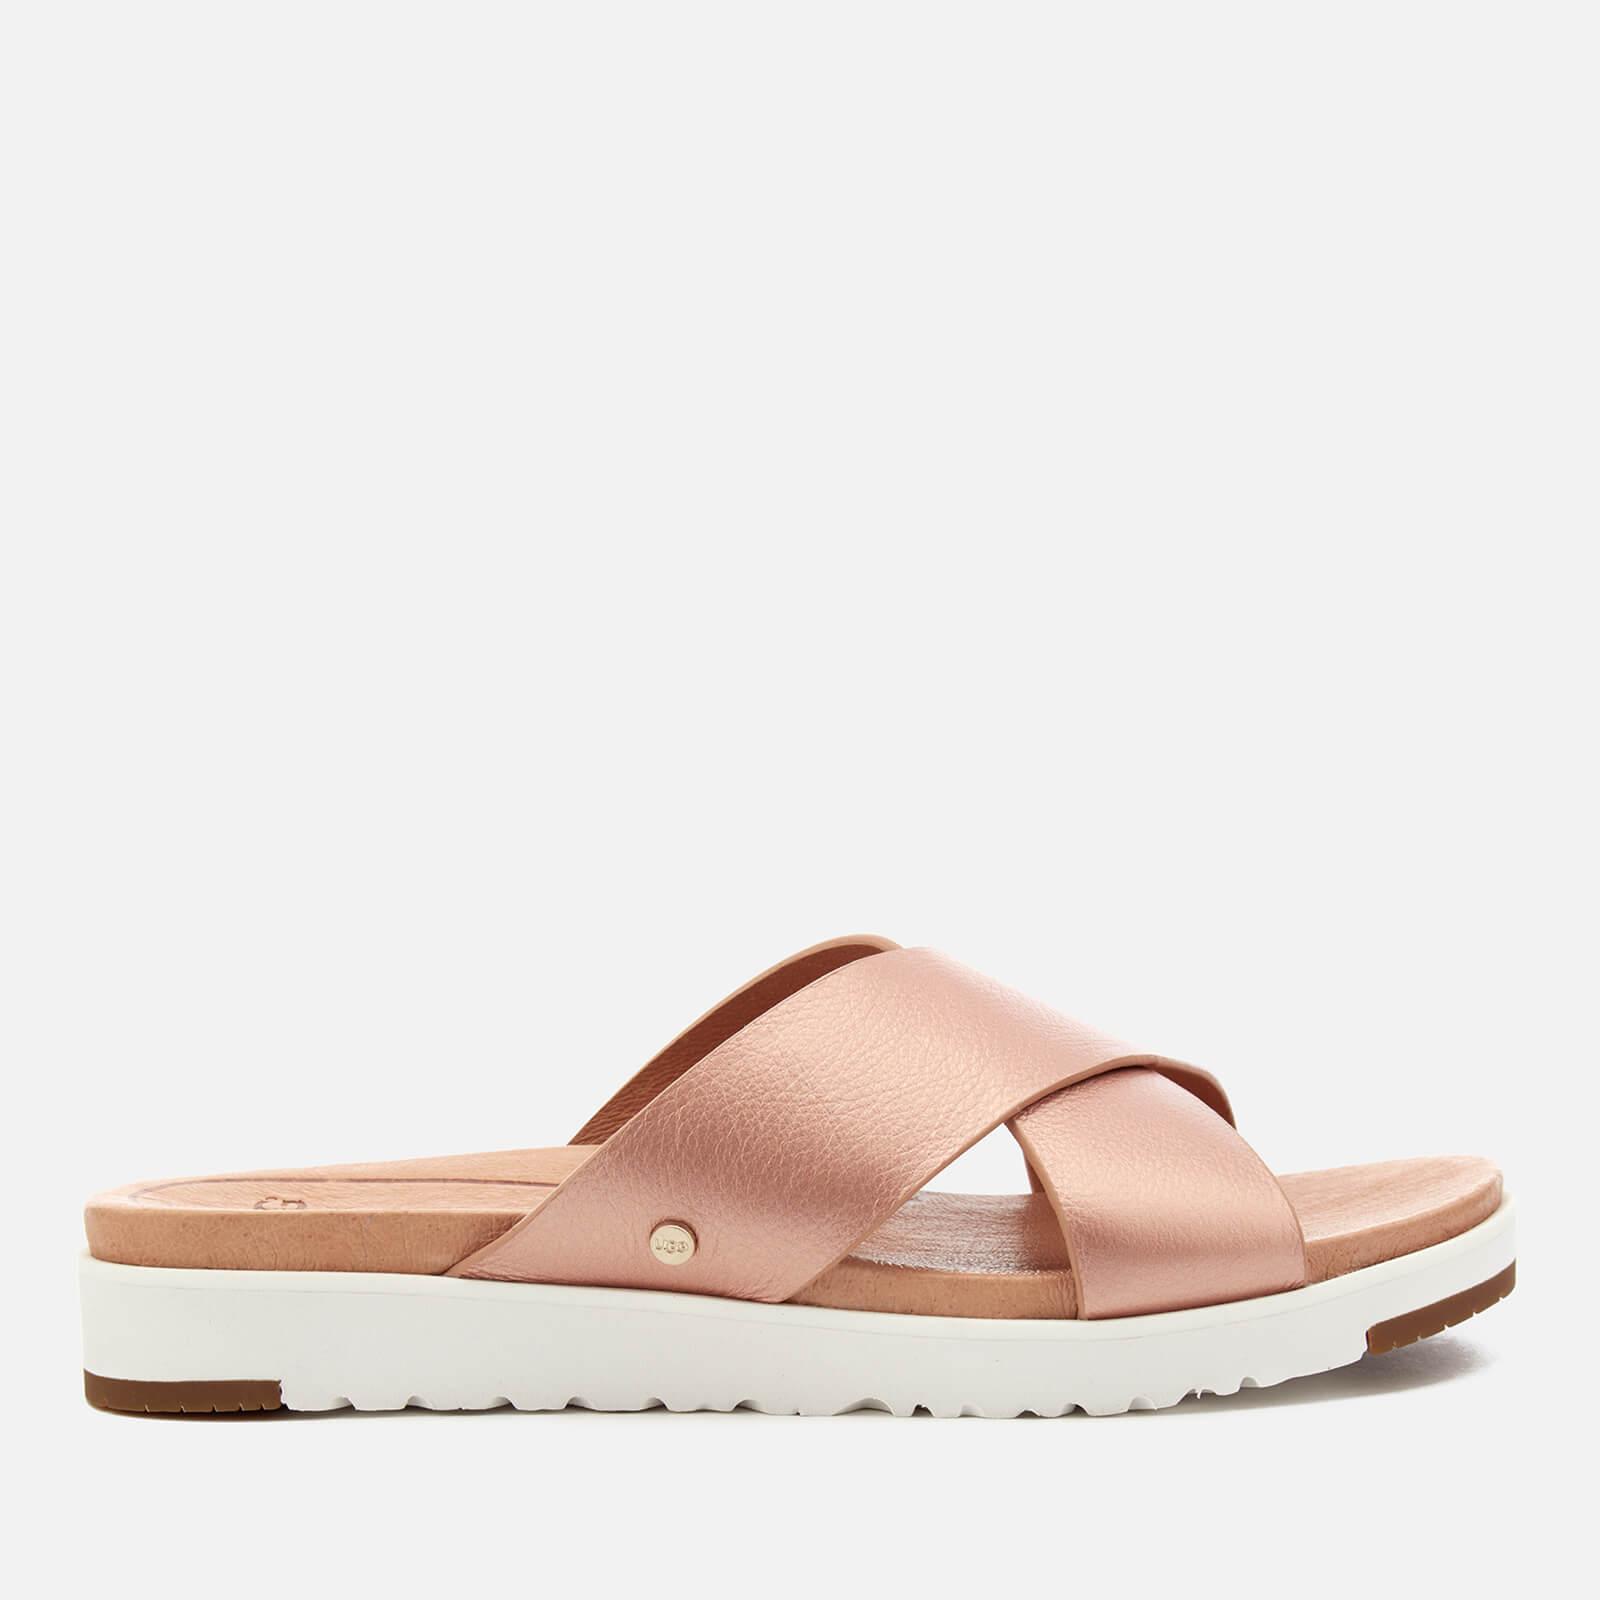 Ugg Women S Kari Metallic Cross Strap Slide Sandals Rose Gold Free Uk Delivery Allsole